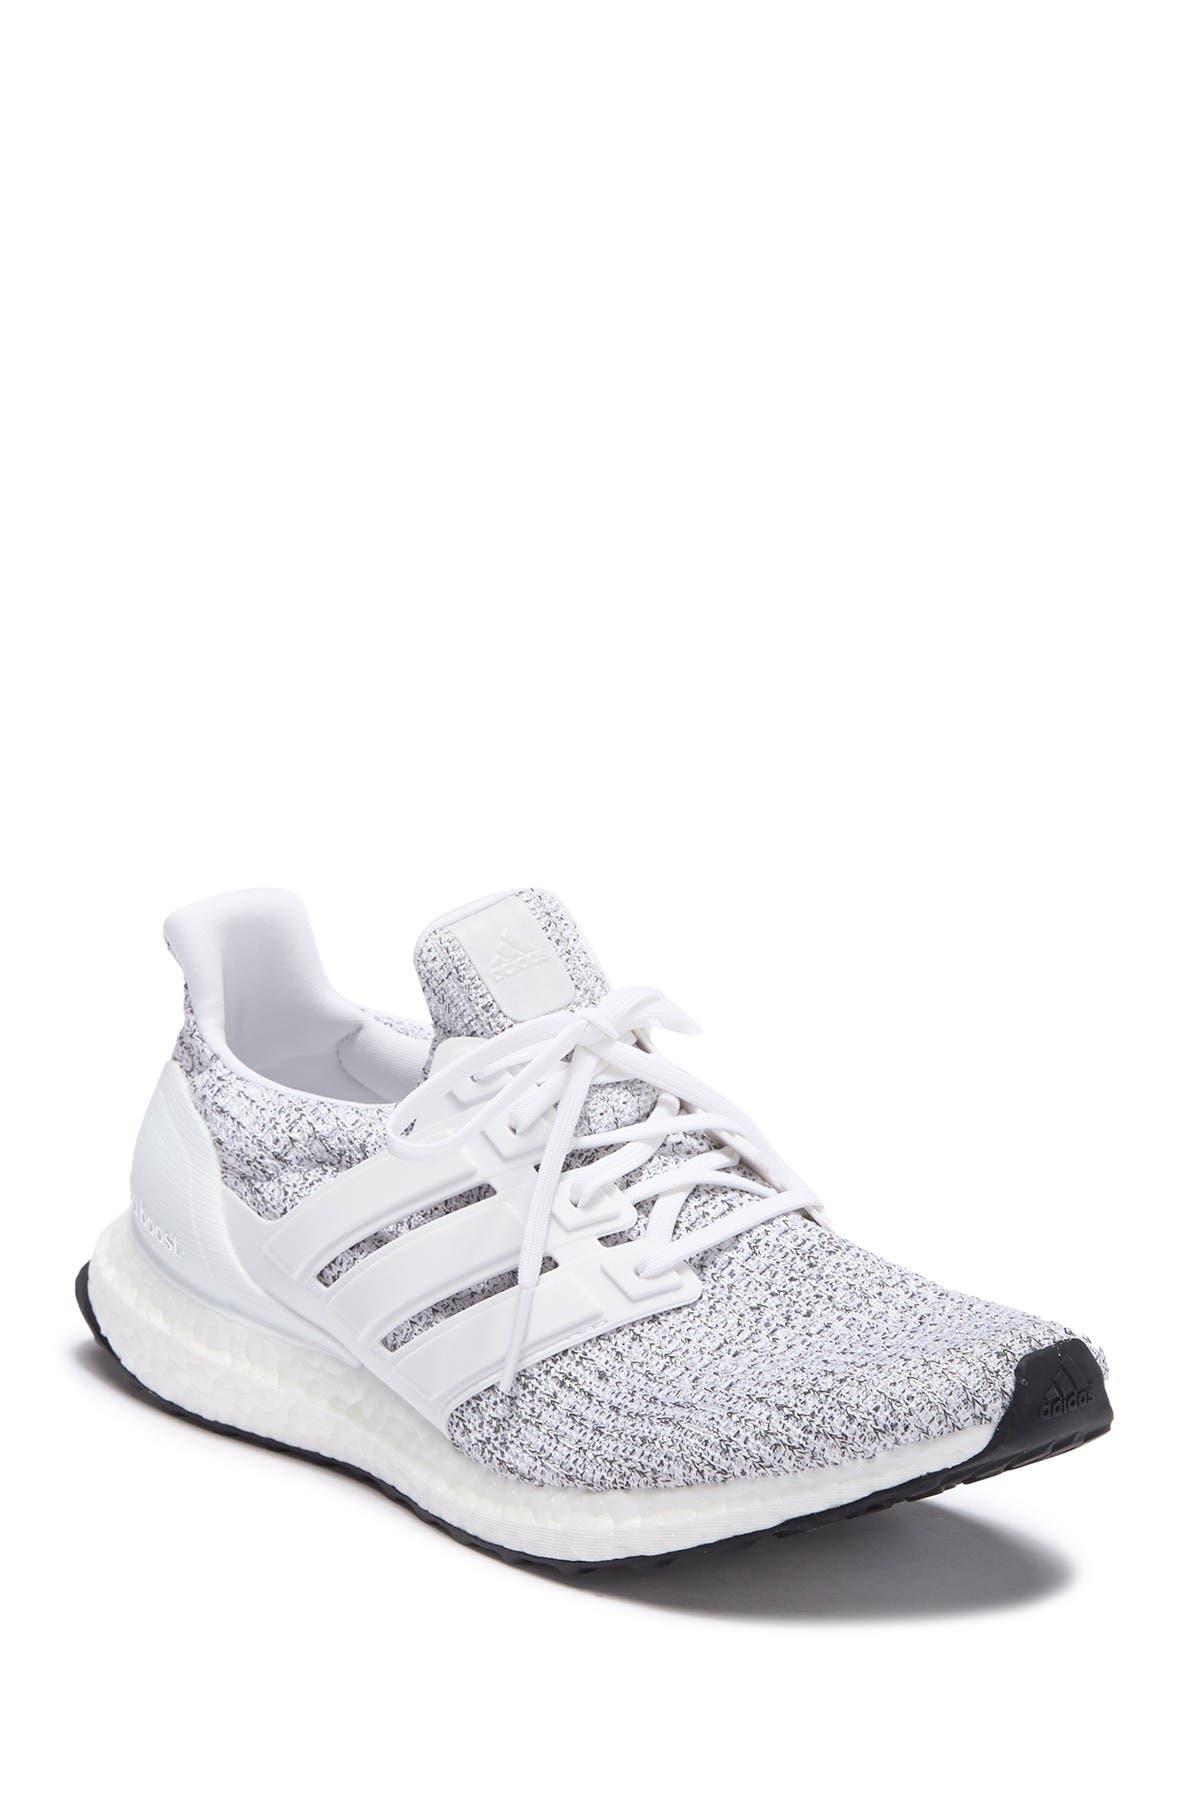 adidas | UltraBoost Sneaker | Nordstrom